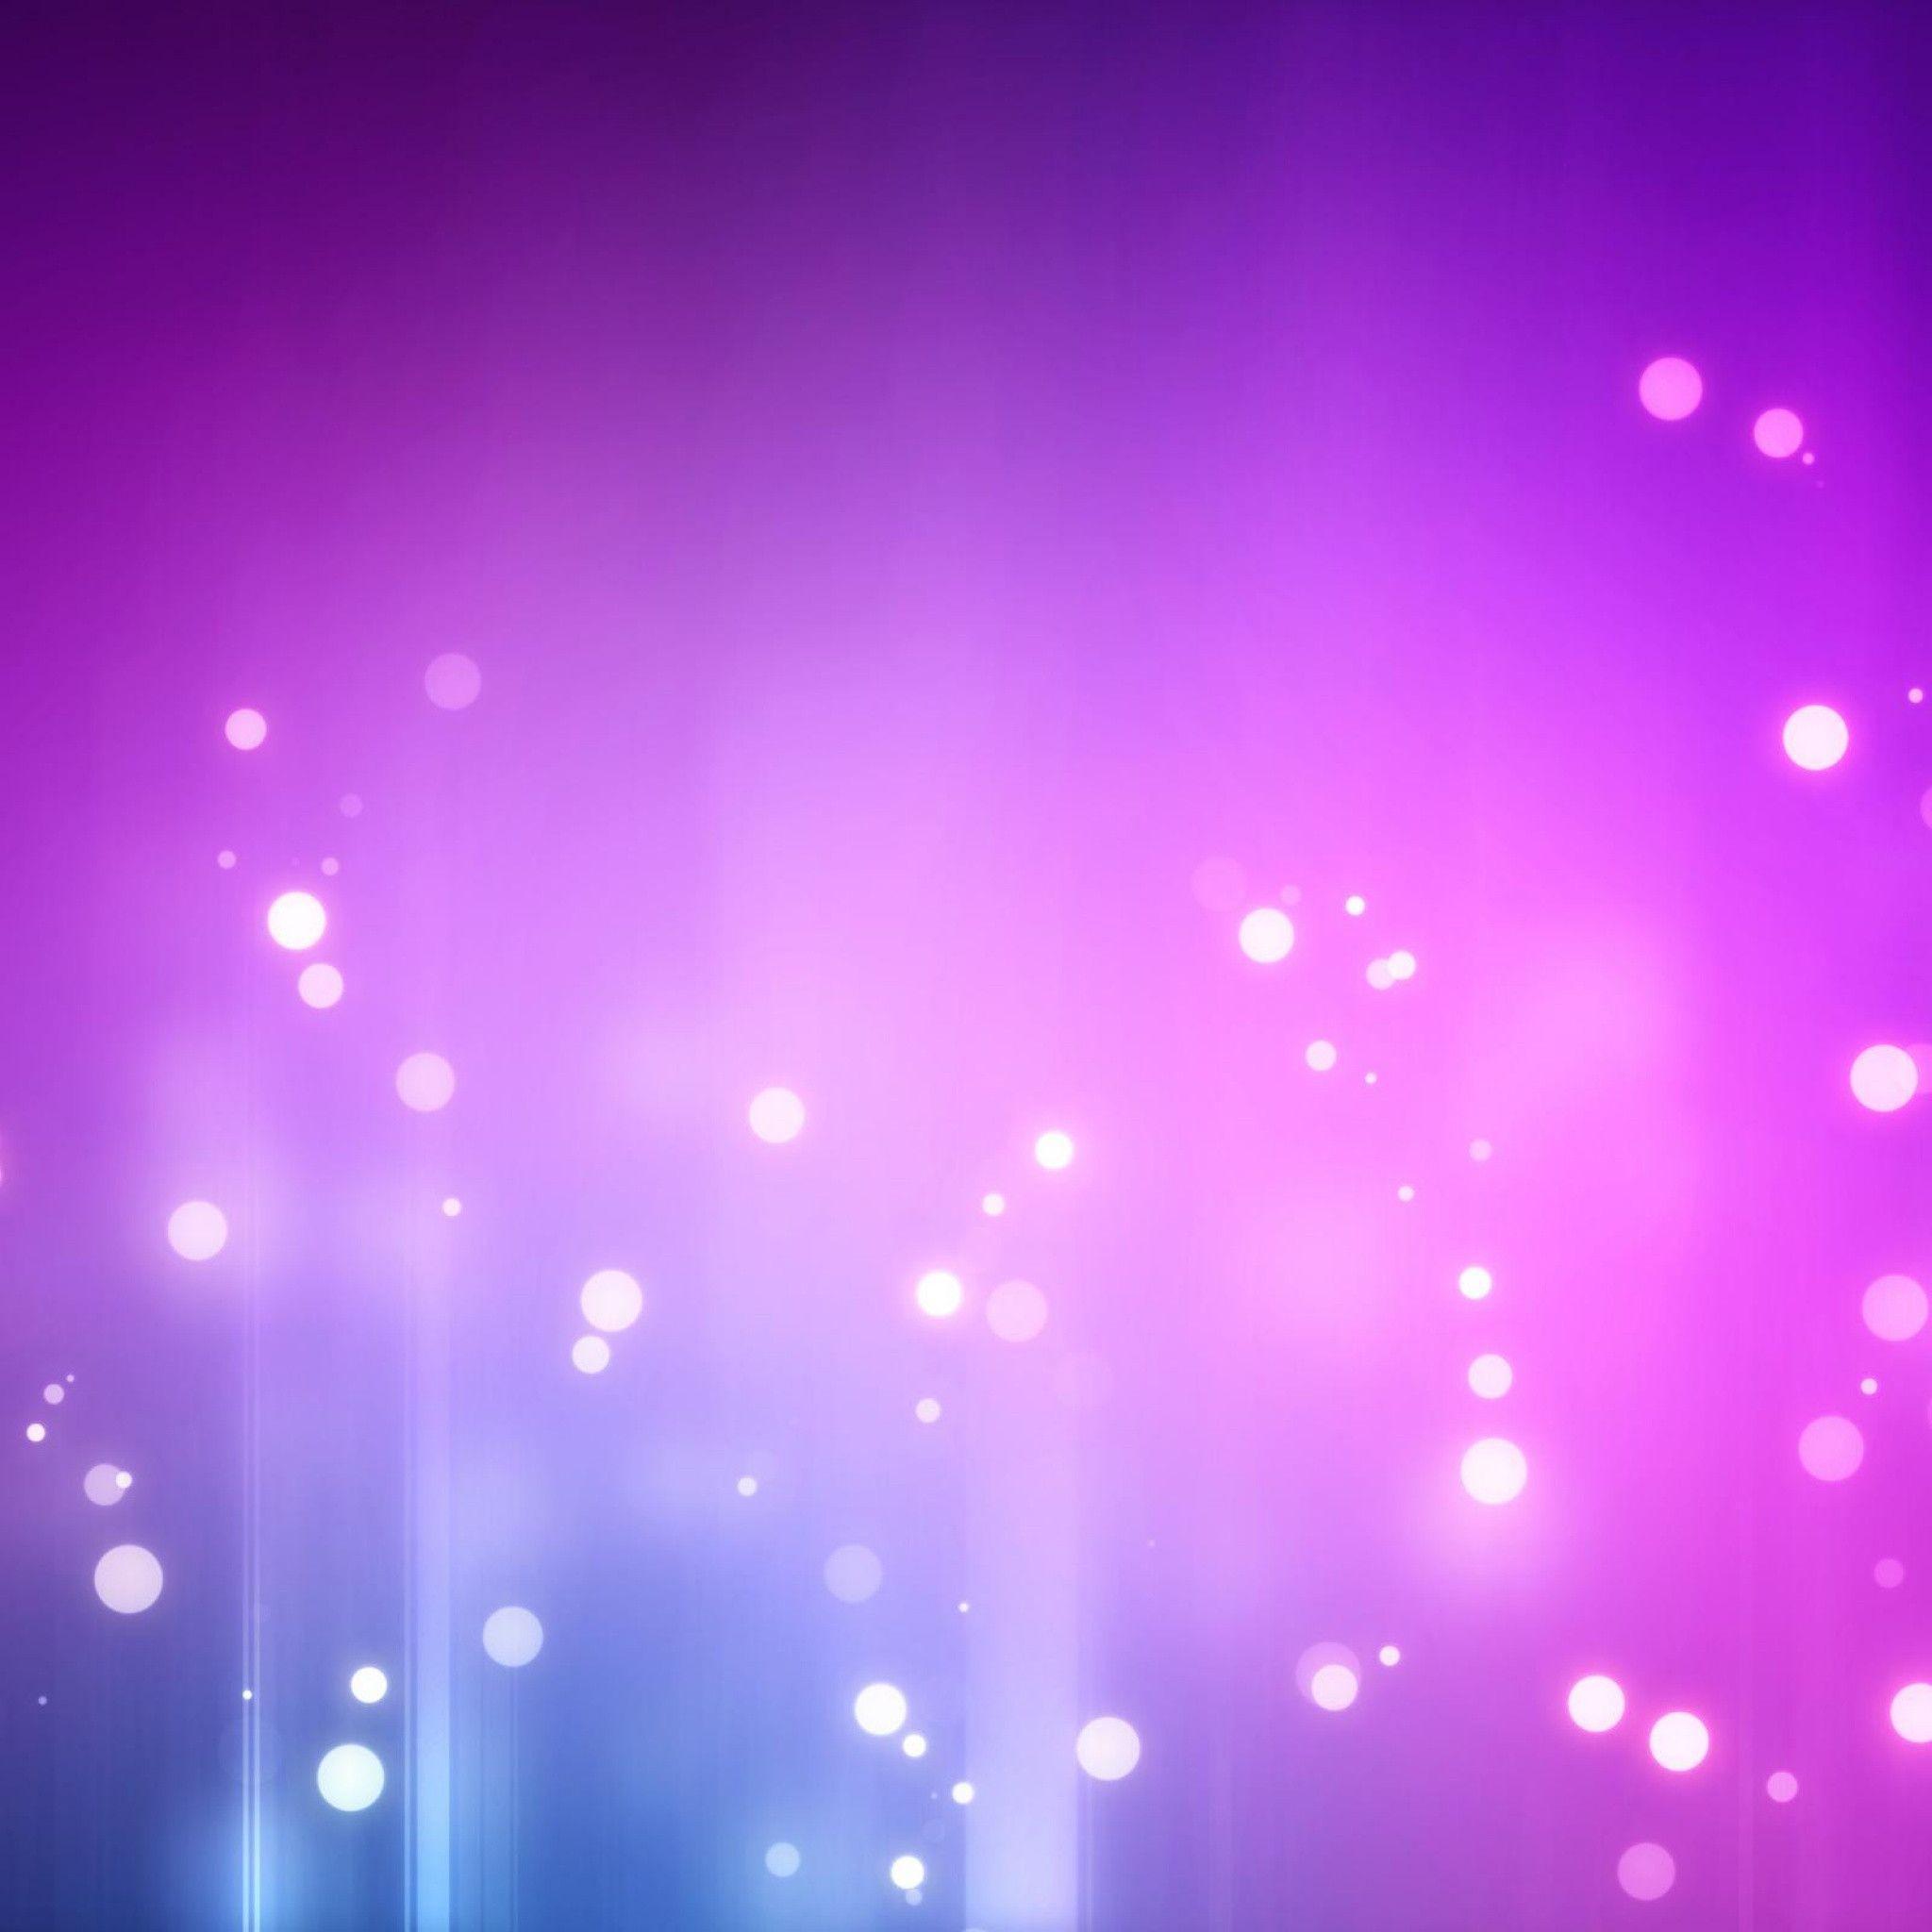 Black Pink Windows Wallpaper: Download Purple Phone Wallpapers Gallery